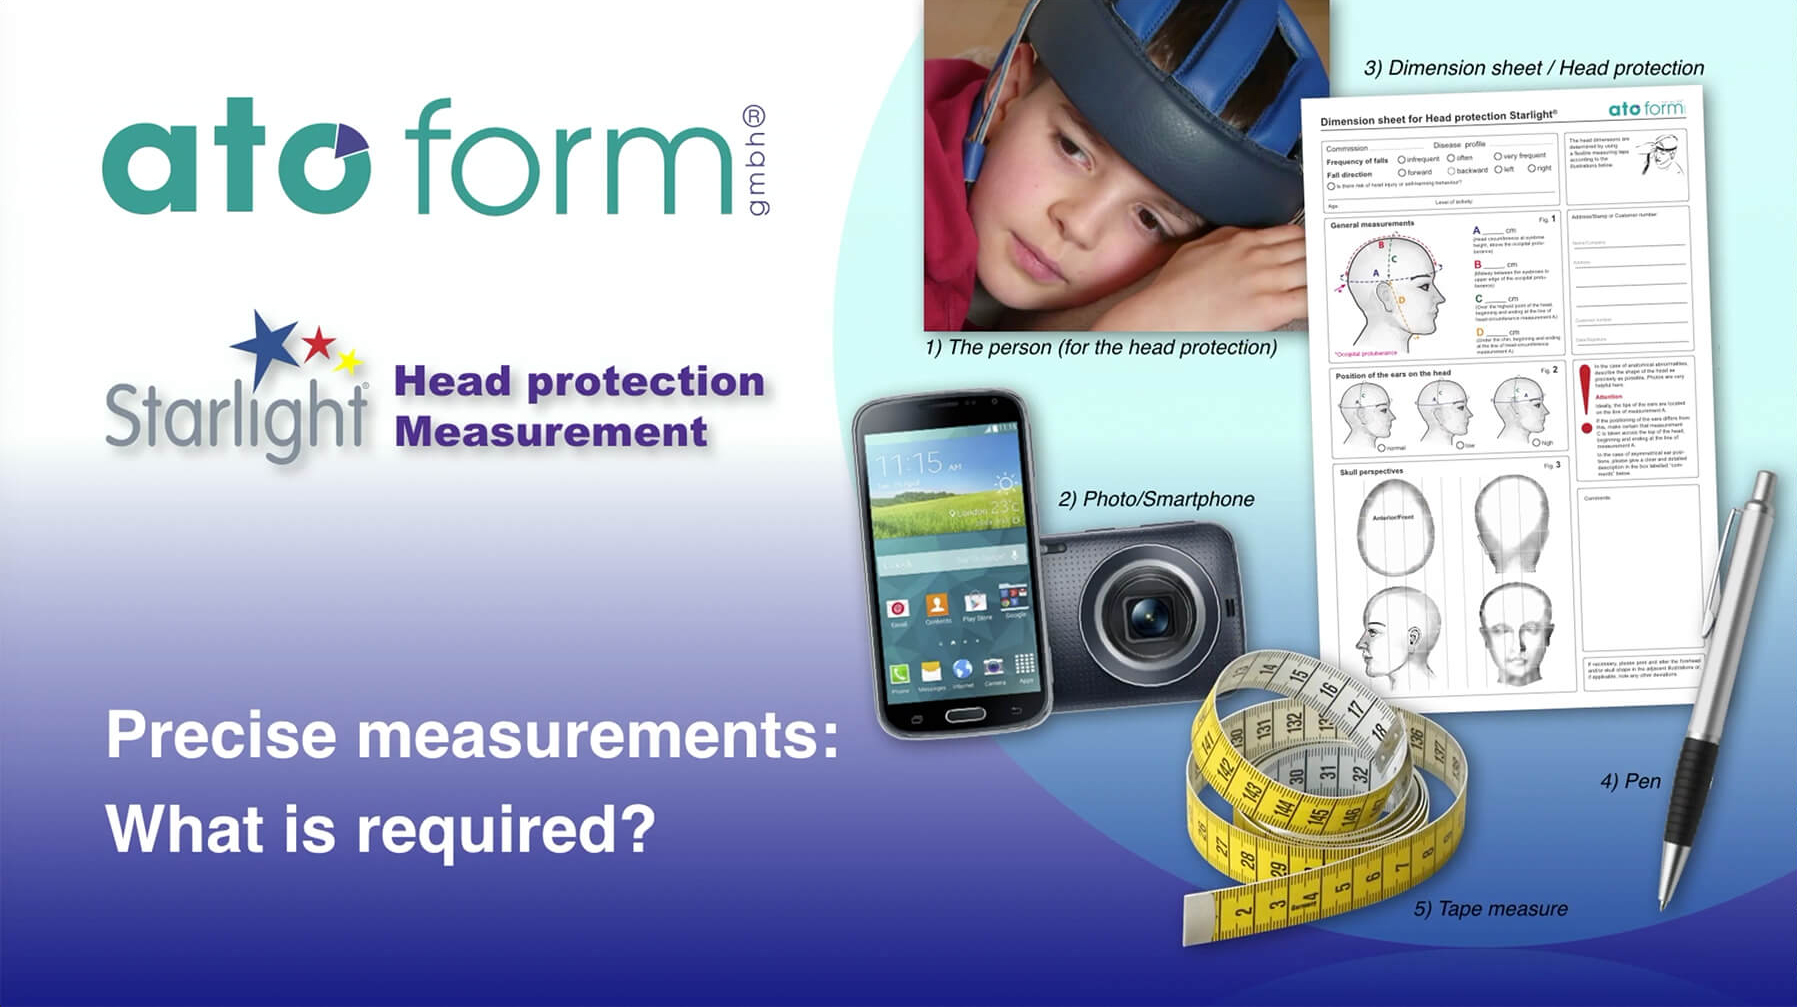 Measurement head protection